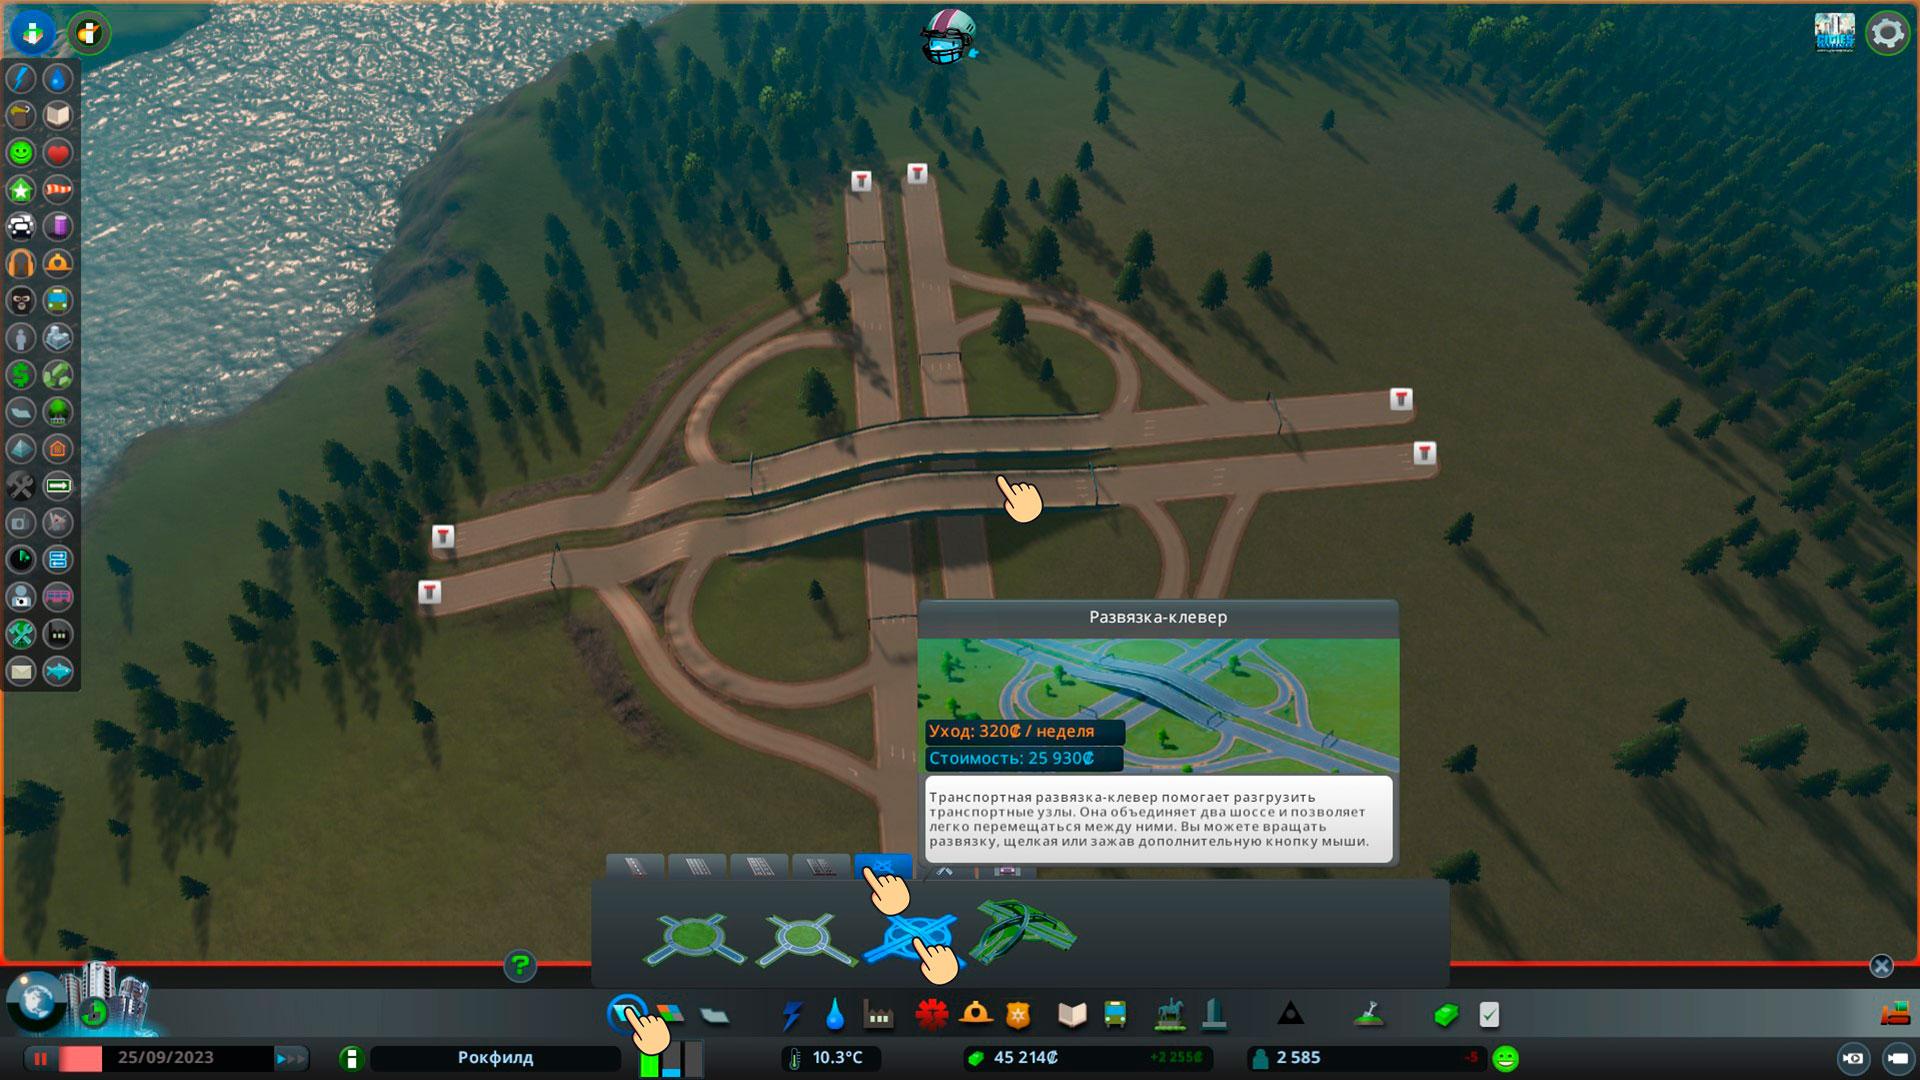 транспортные развязки cities skyline